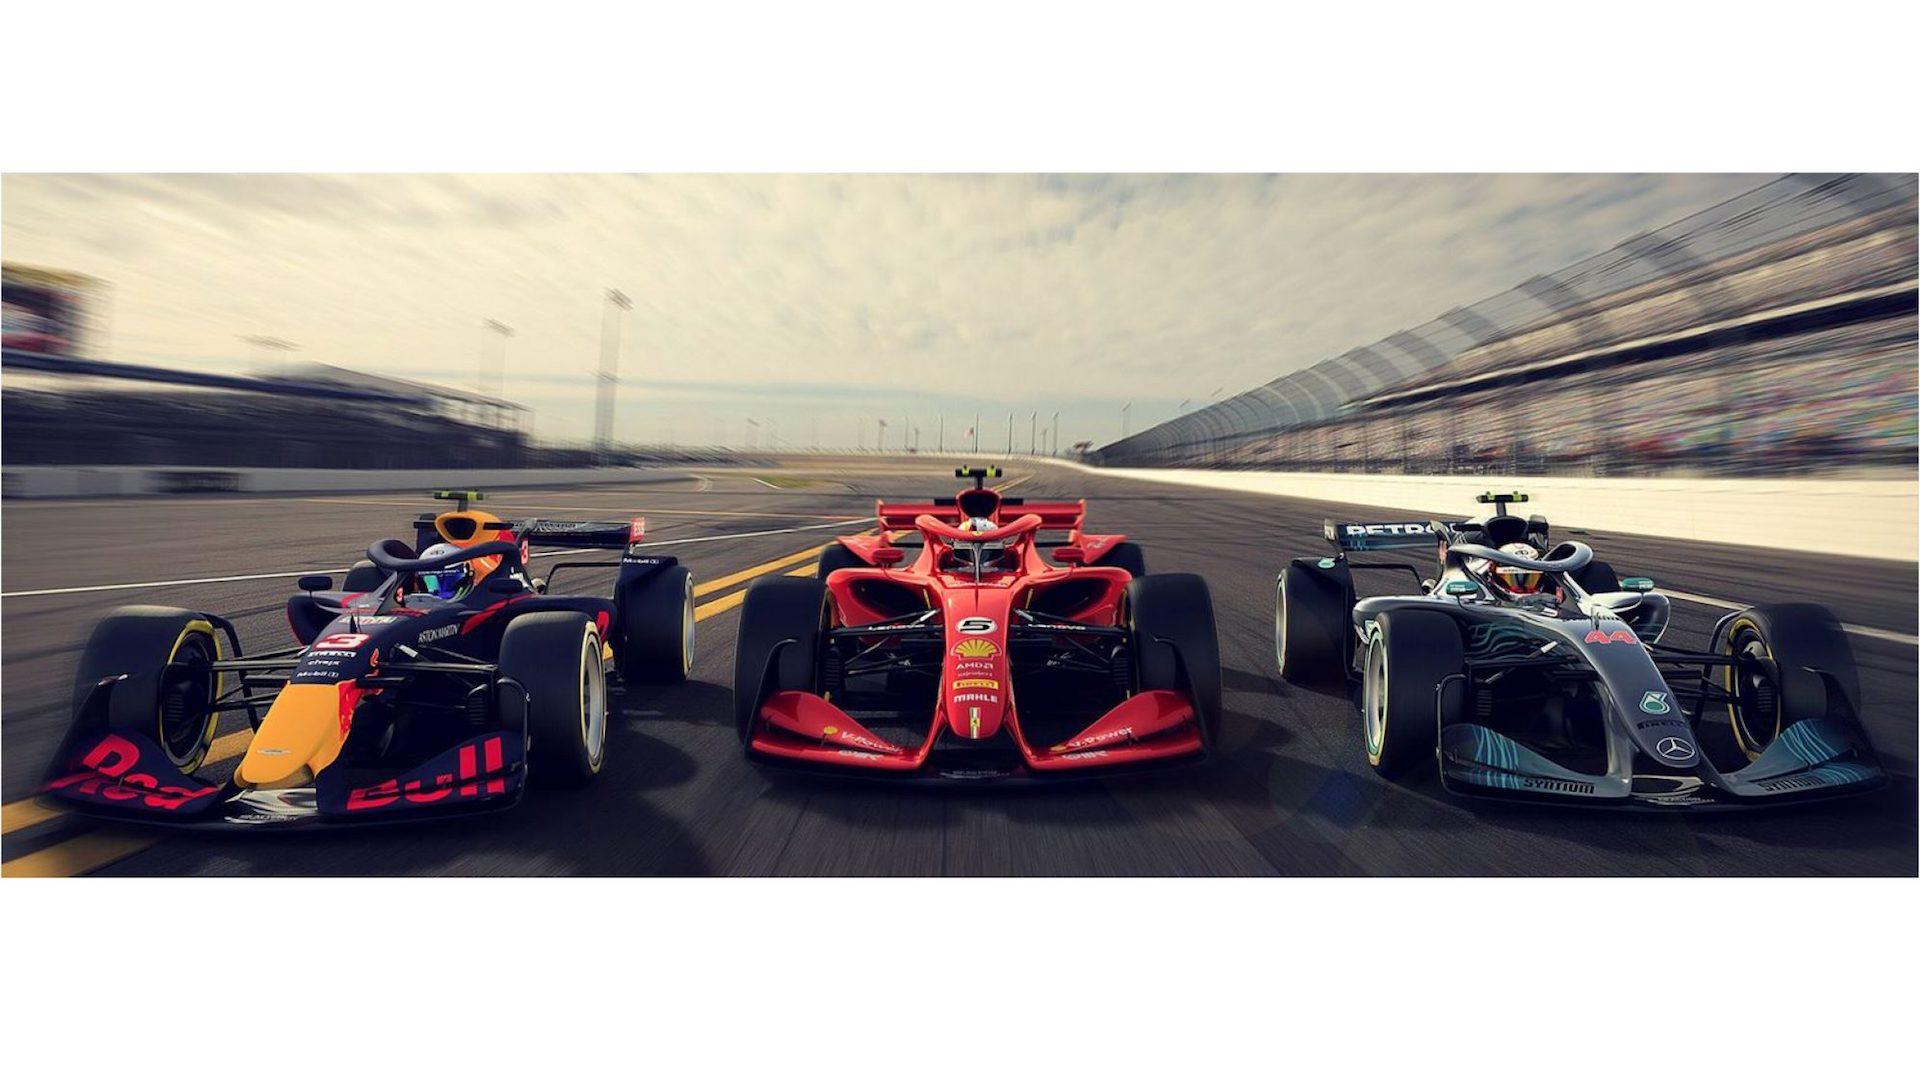 2021 F1 car design proposals focus on aerodynamics for better racing 1920x1080